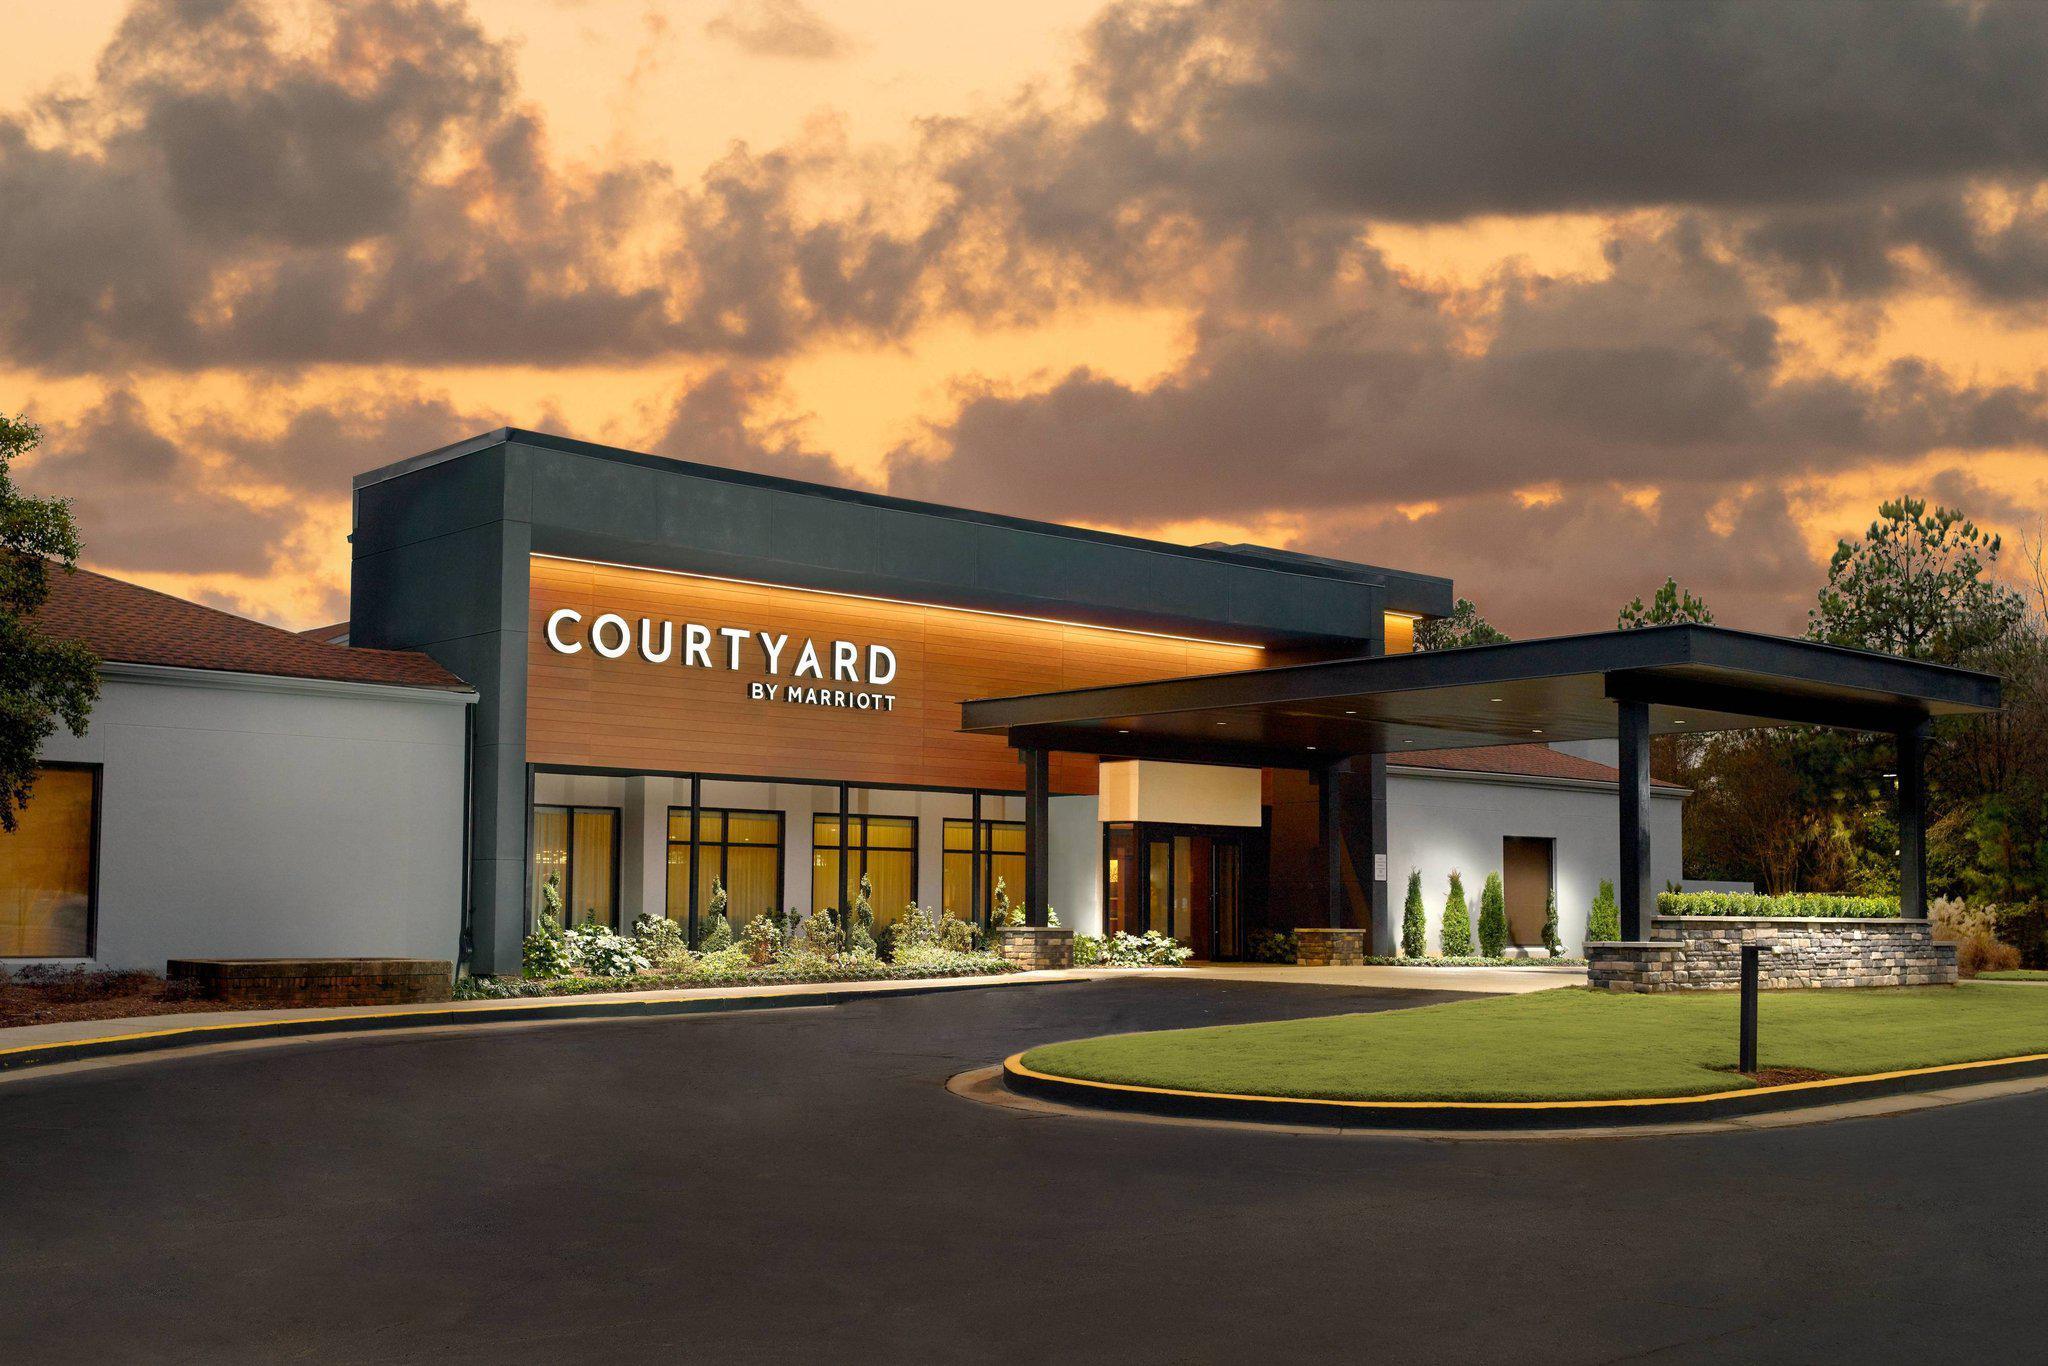 Courtyard by Marriott Atlanta Airport South/Sullivan Road